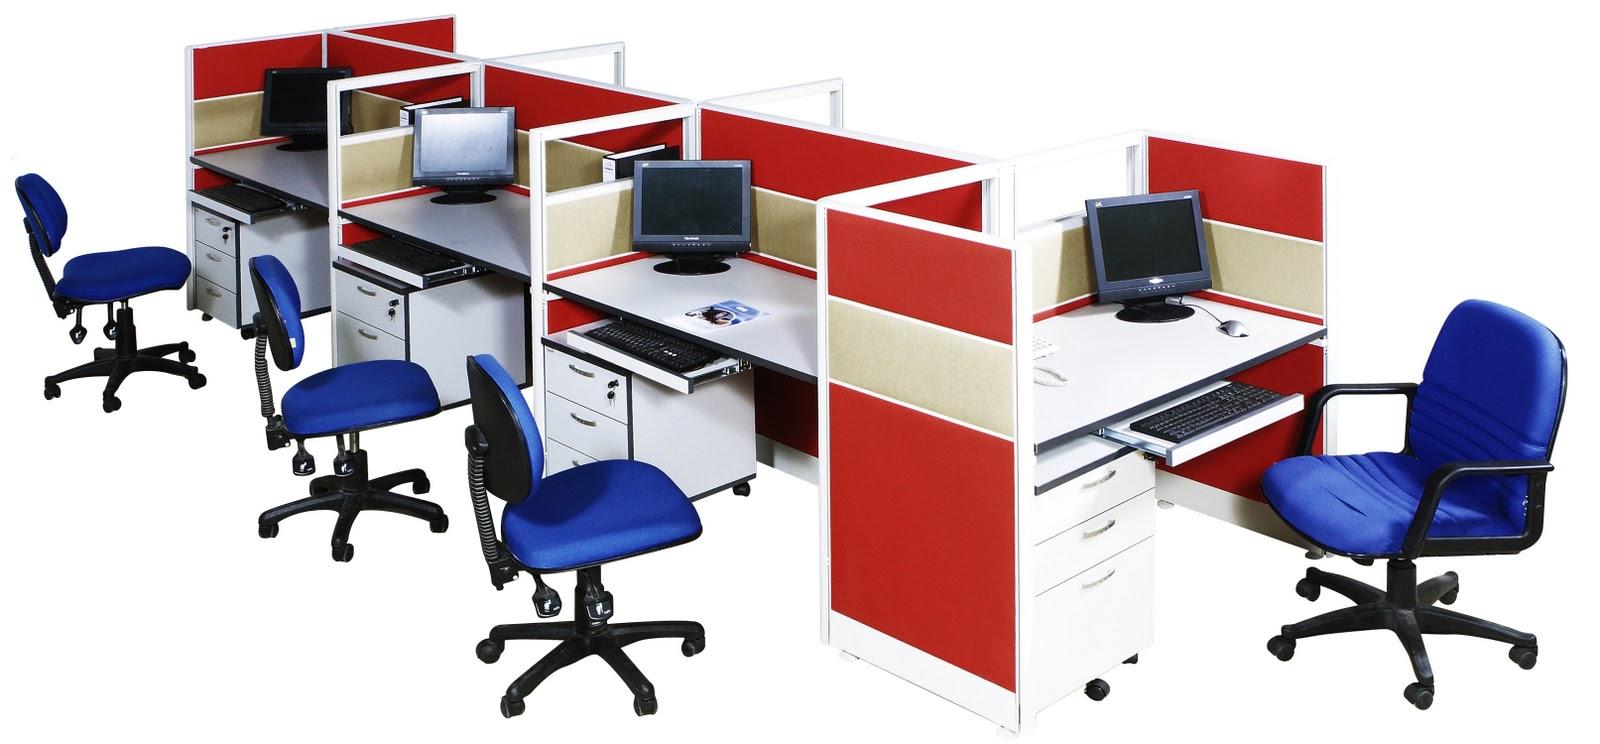 Partisimeja Kerjafilling Cabinetkursi Kantormeja Komputerrak Meja Komputer Bukudll